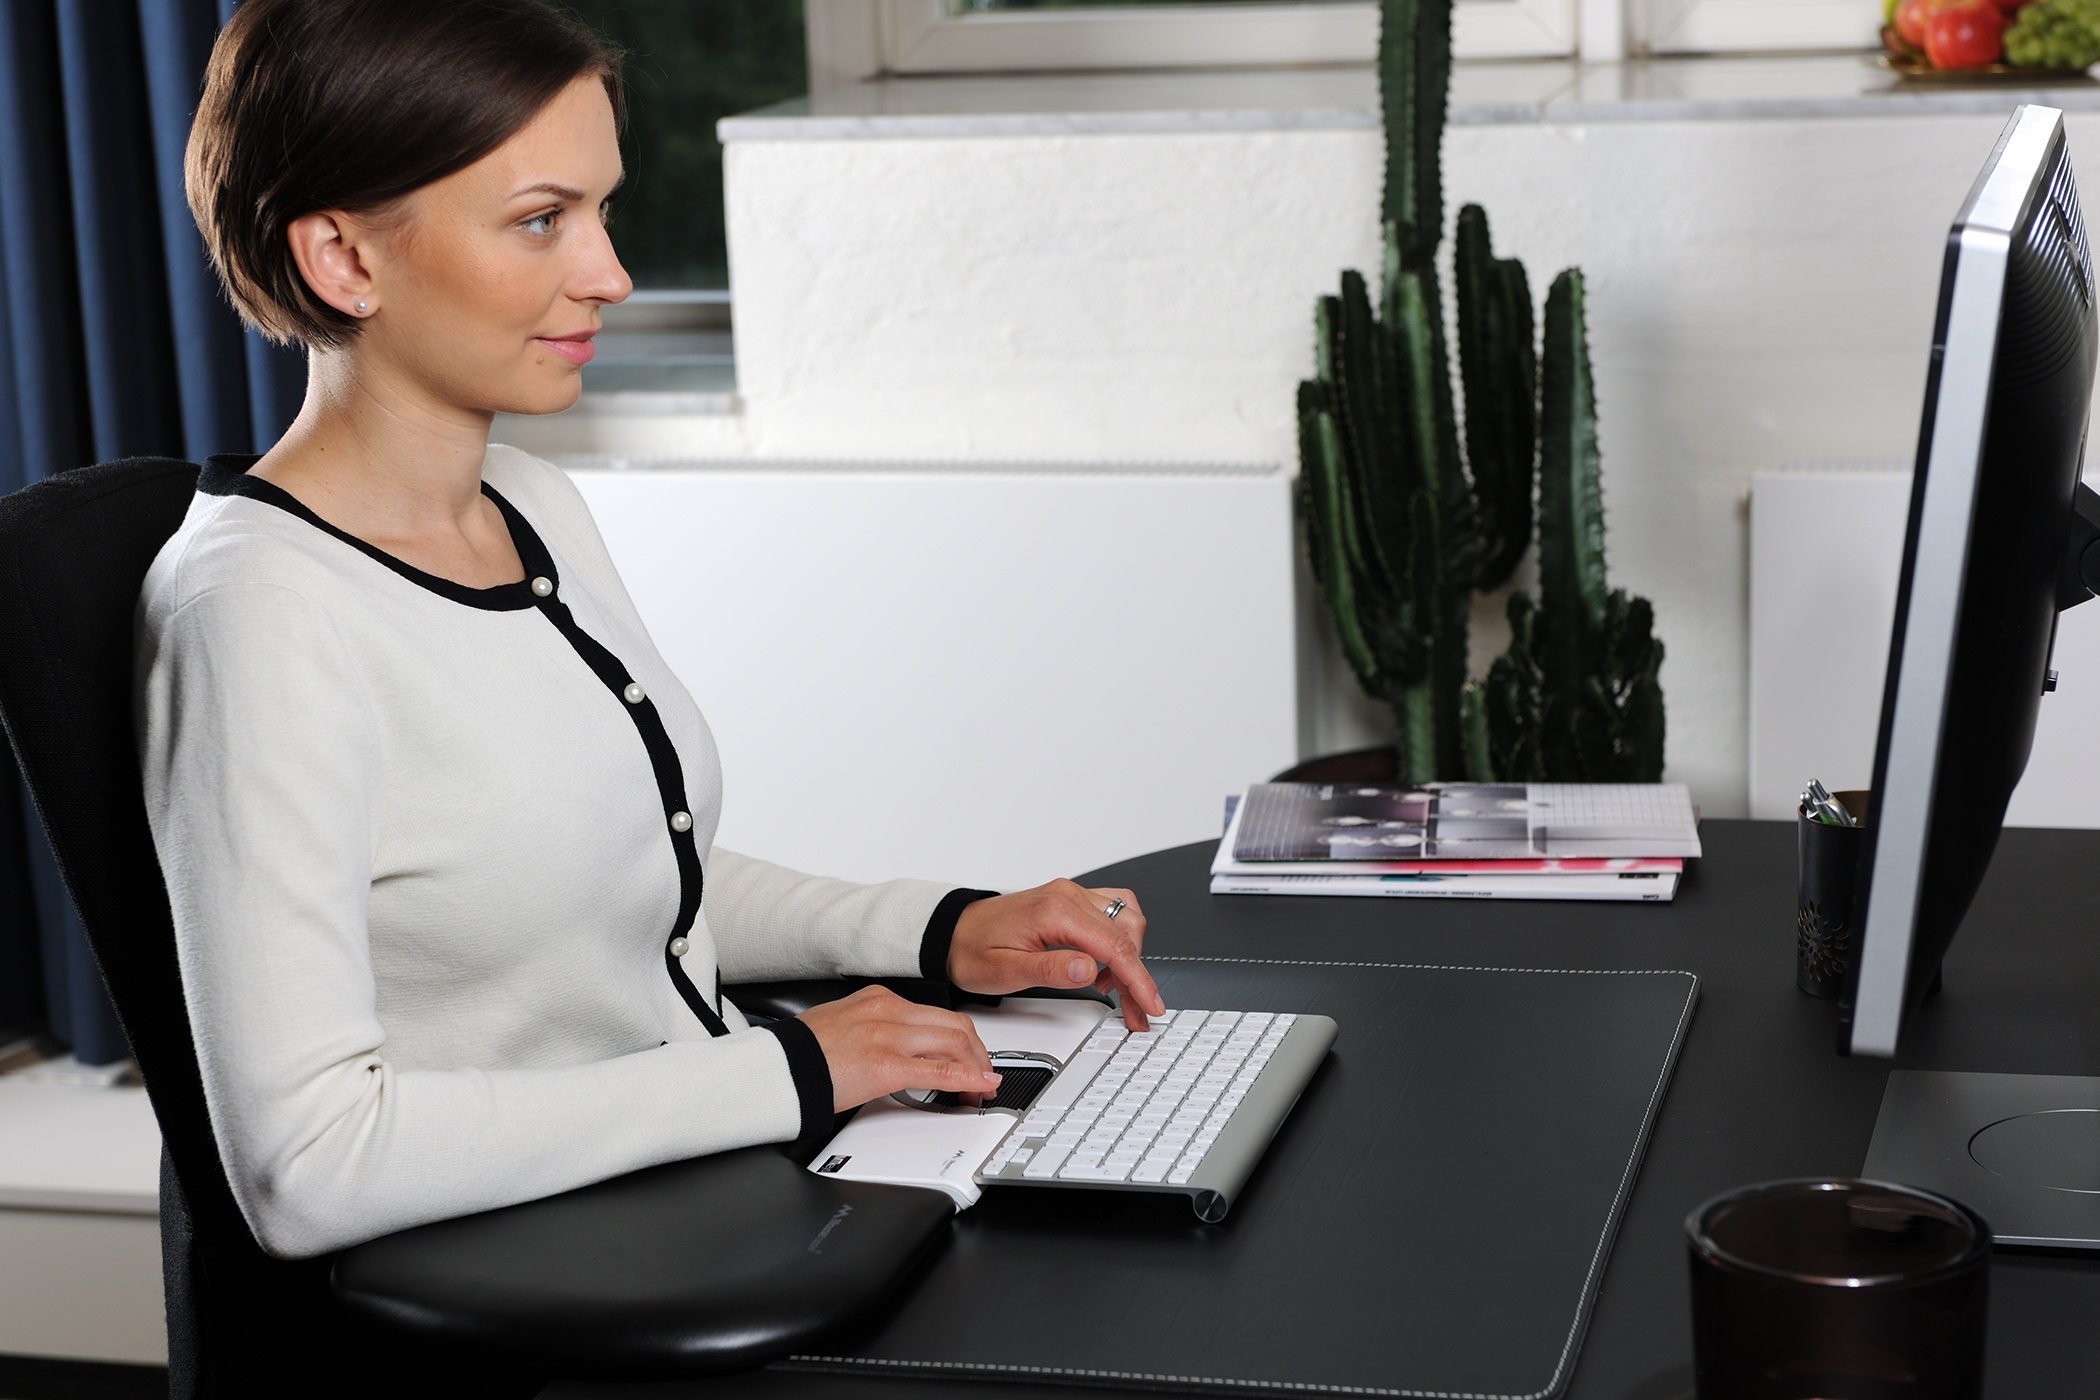 ergonomisch advies fysiotherapeut